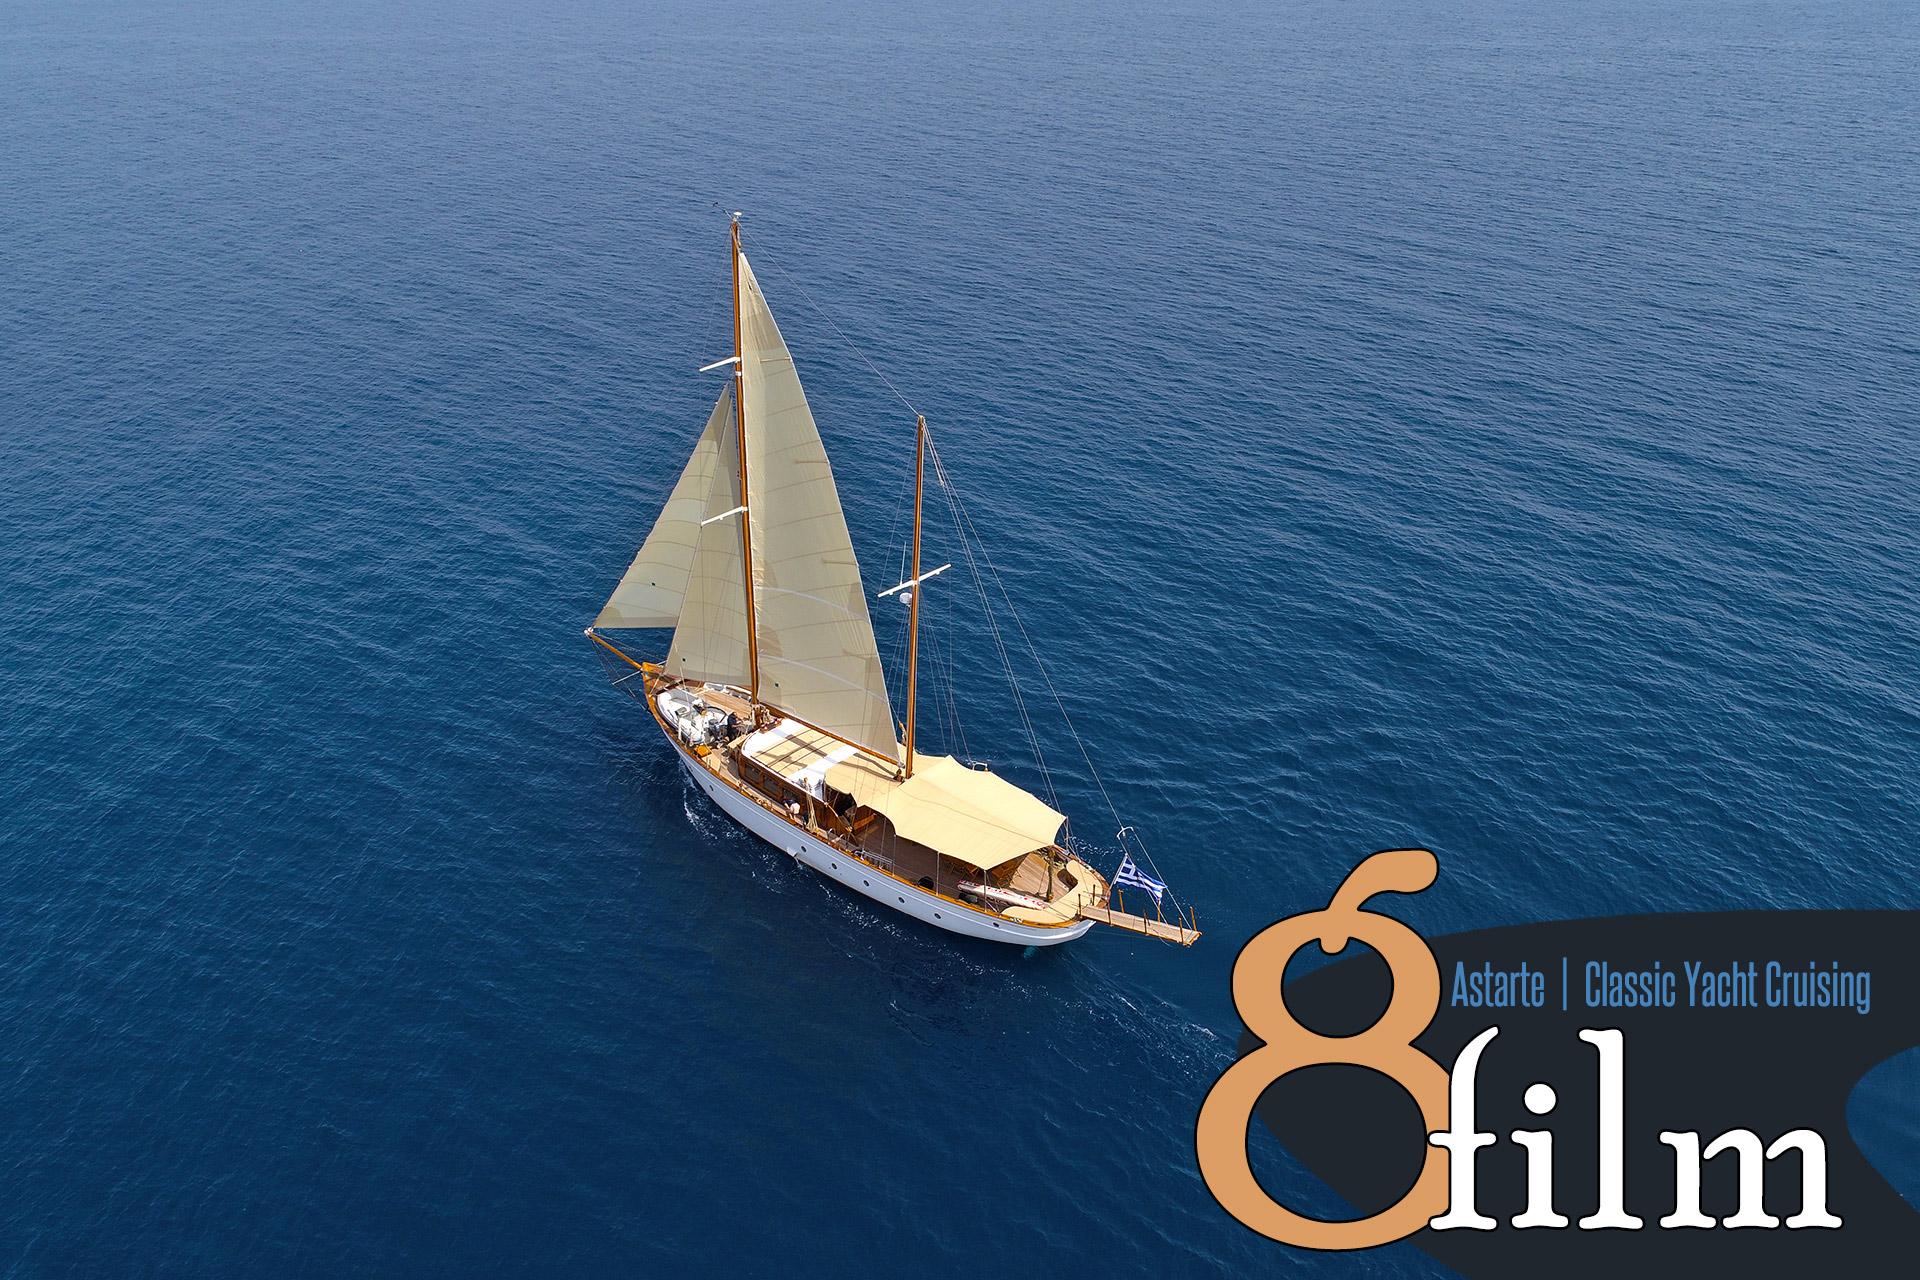 ASTARTE | Classic Yacht Cruising | 8 Film